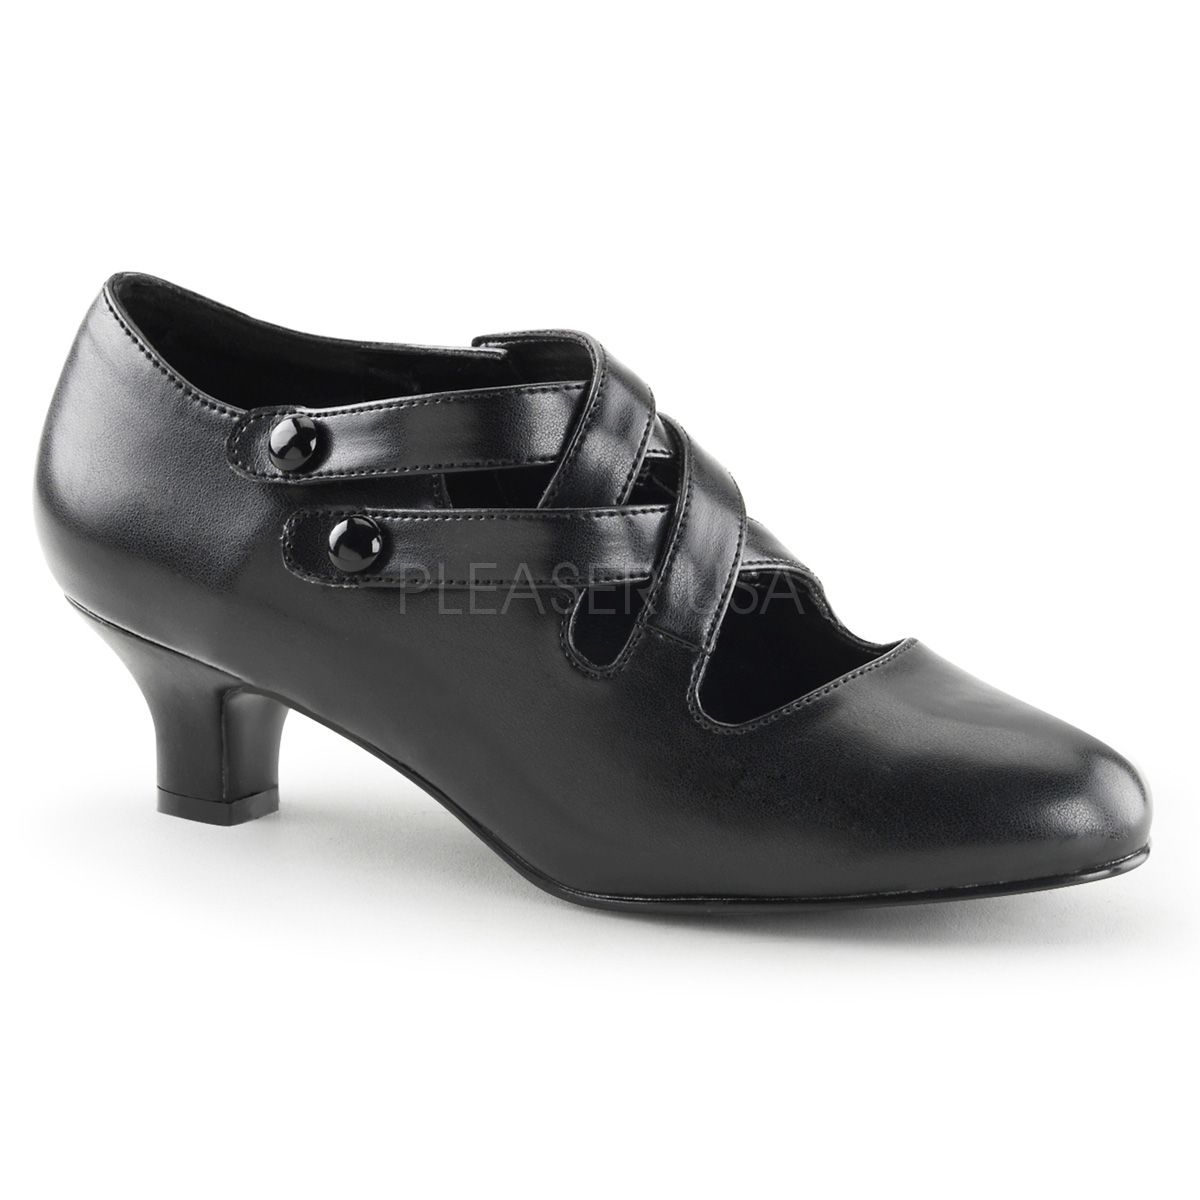 Wearifudare, High Heel Shoes   Pleaser Shoes   Bordello   Domonia   Devious   Fabulicious   Funtasma   Pleaser   http://wearifudare.co.uk/store/all-pleaser-shoes/pleaser-funtasma-dame-02-black-kitten-heel-pumps-8270/